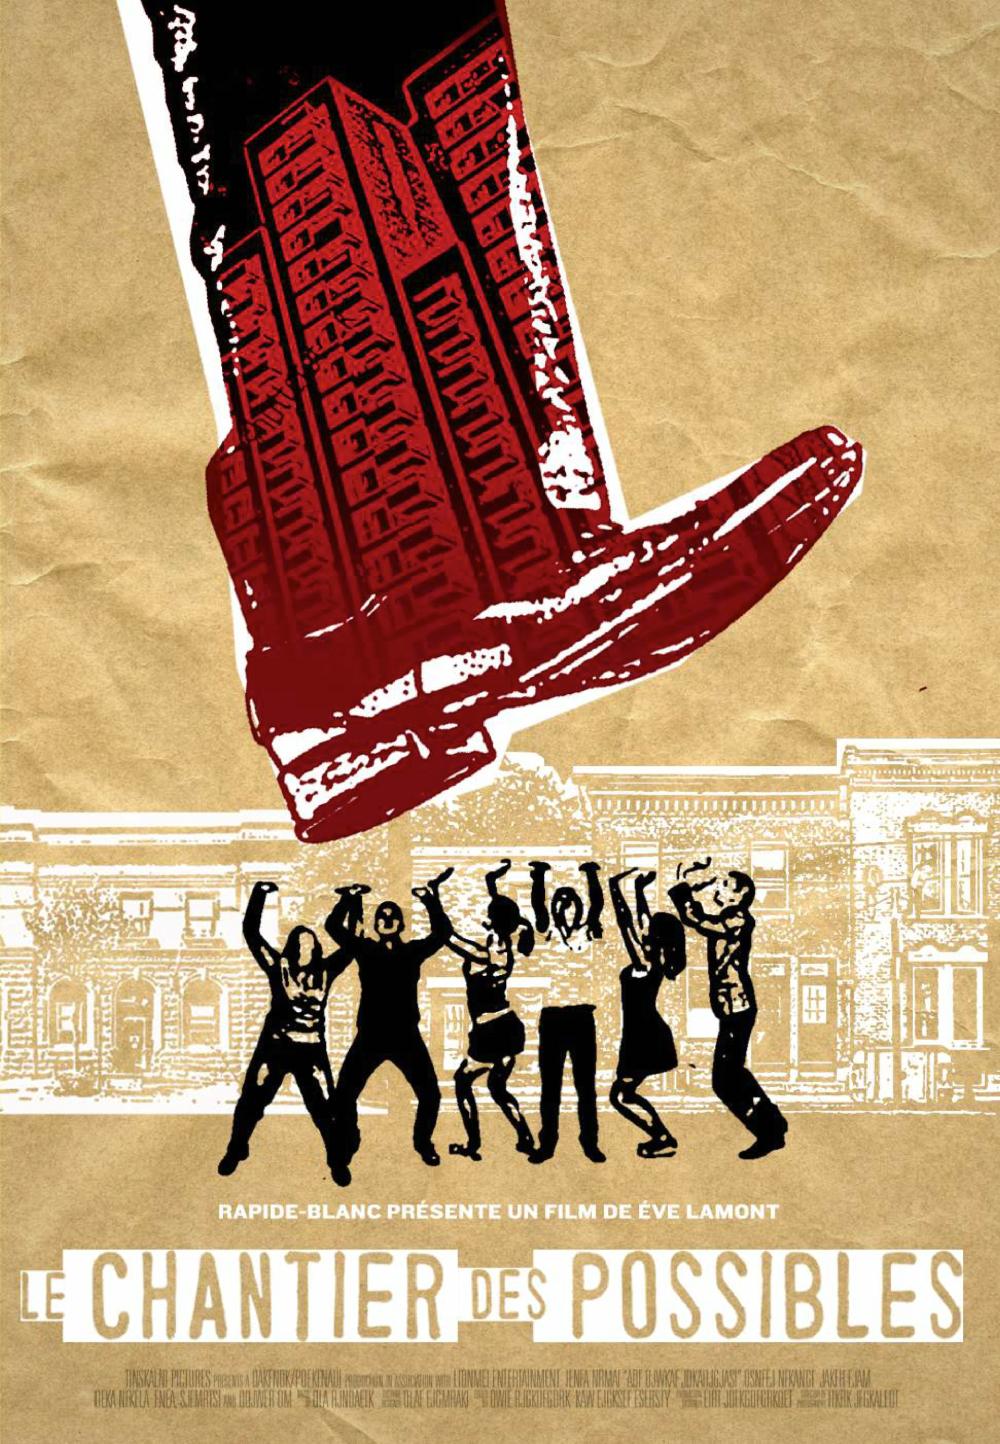 postercomrades-camaradesaffichistes-Renzo-172.PNG